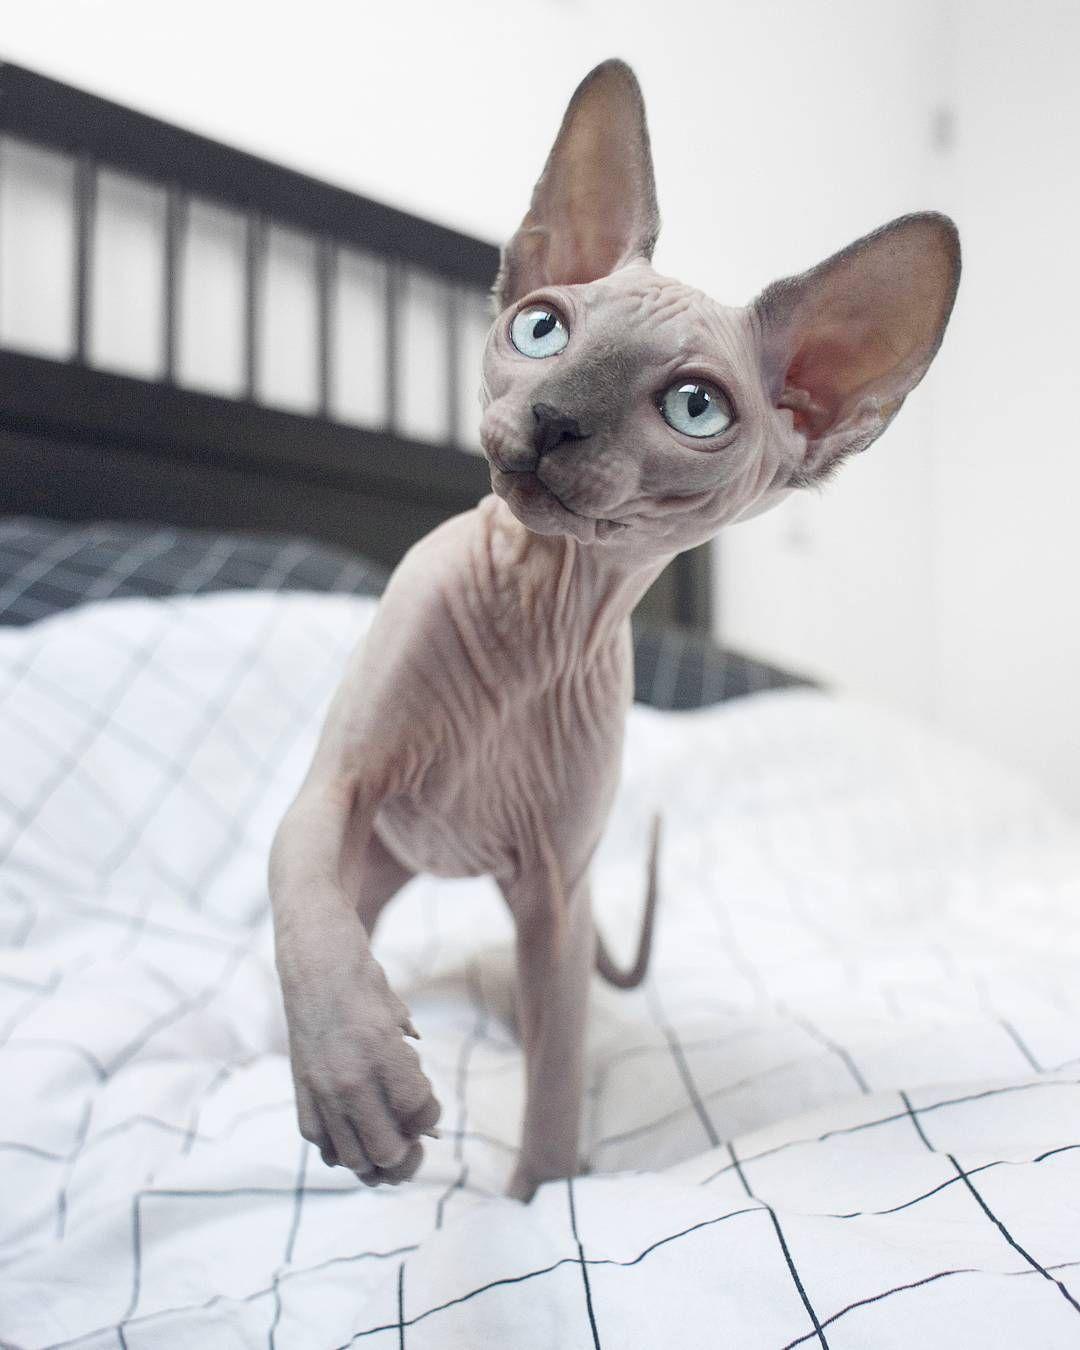 Cream Point Sphynx Kitten Google Search Cute Hairless Cat Cats Hairless Cat